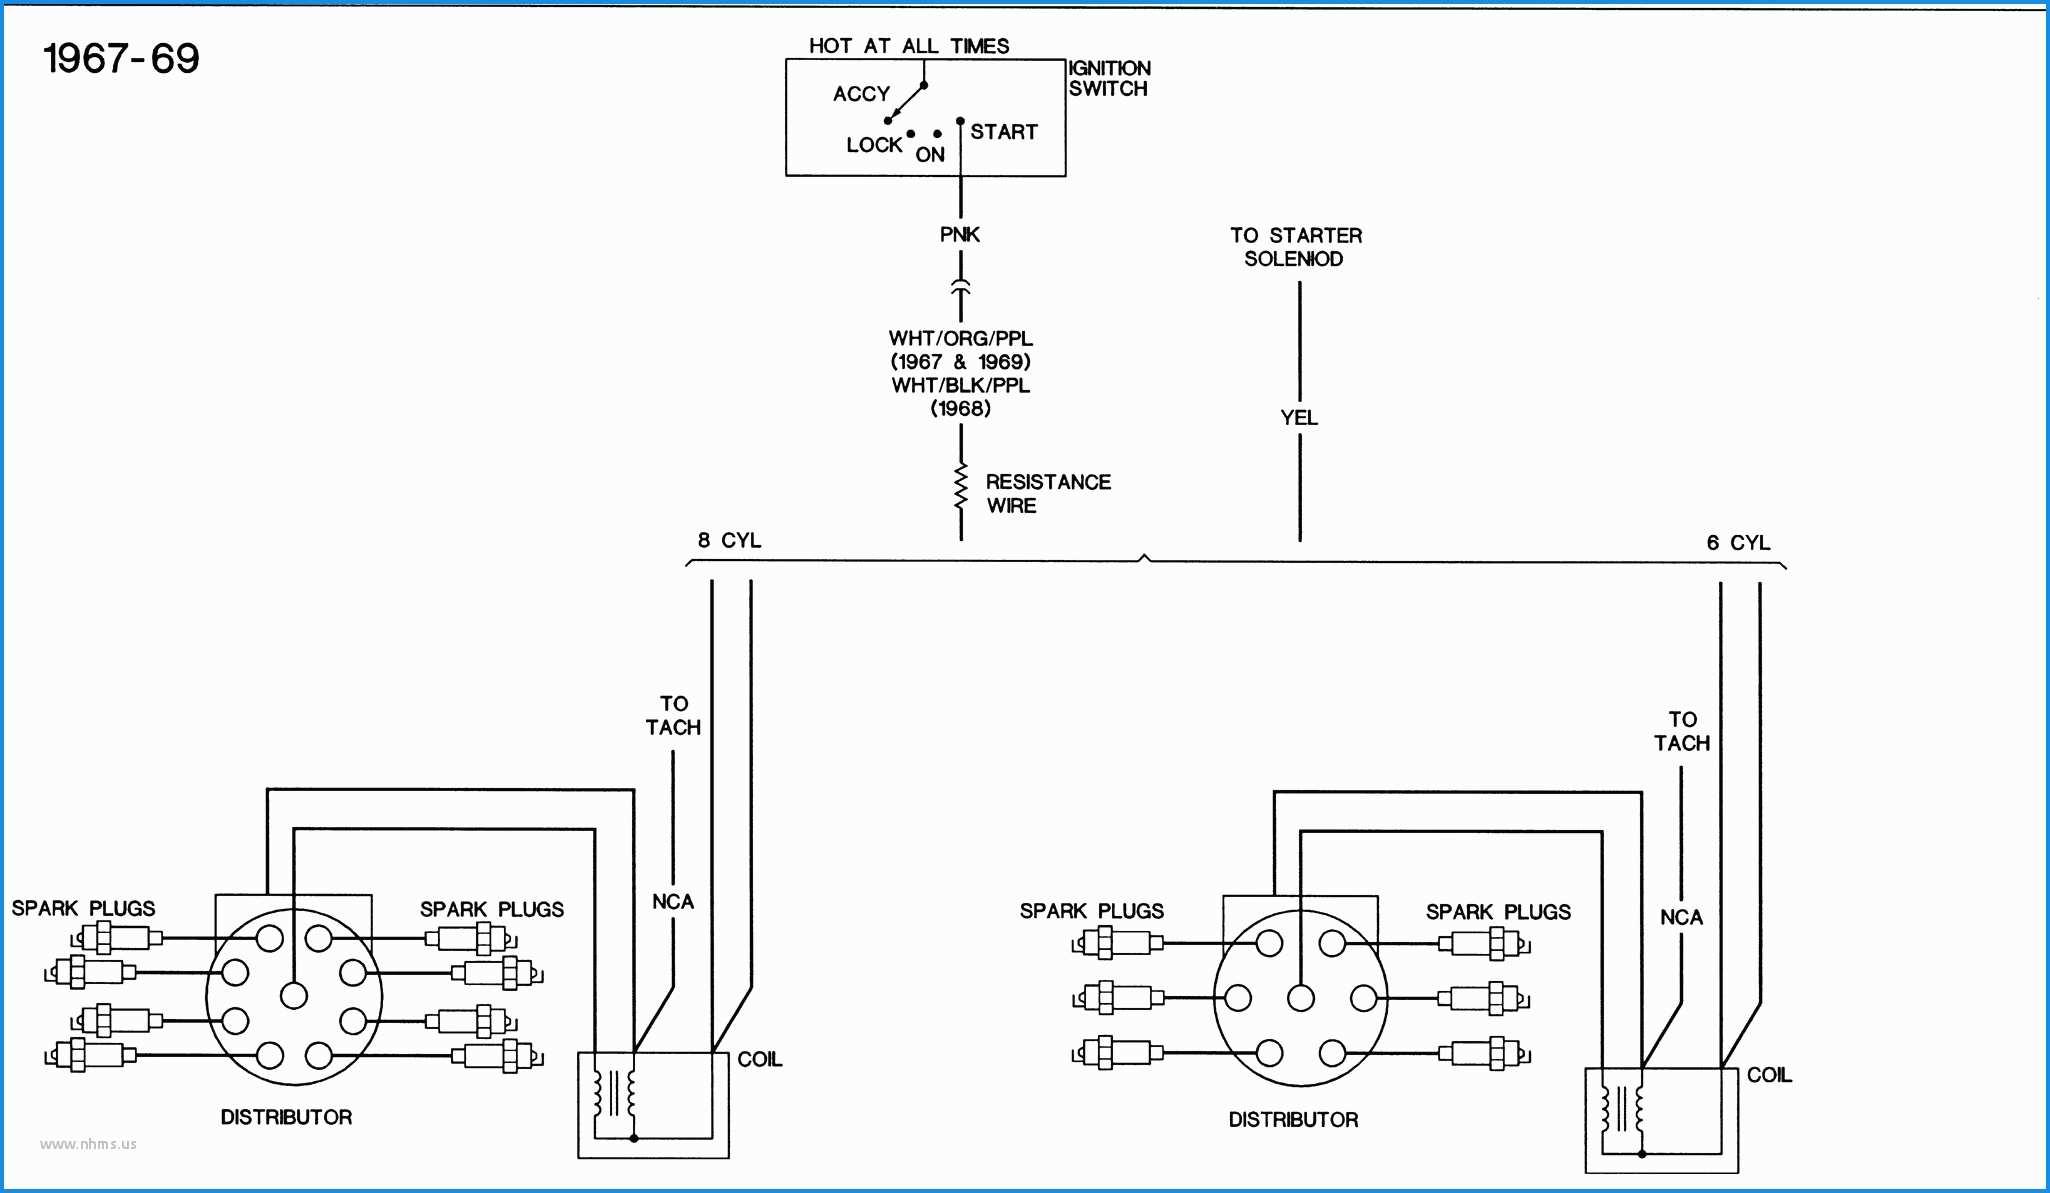 NH_5845] 67 Camaro Gl Diagram Free Download Wiring Diagram Schematic Wiring  Diagram